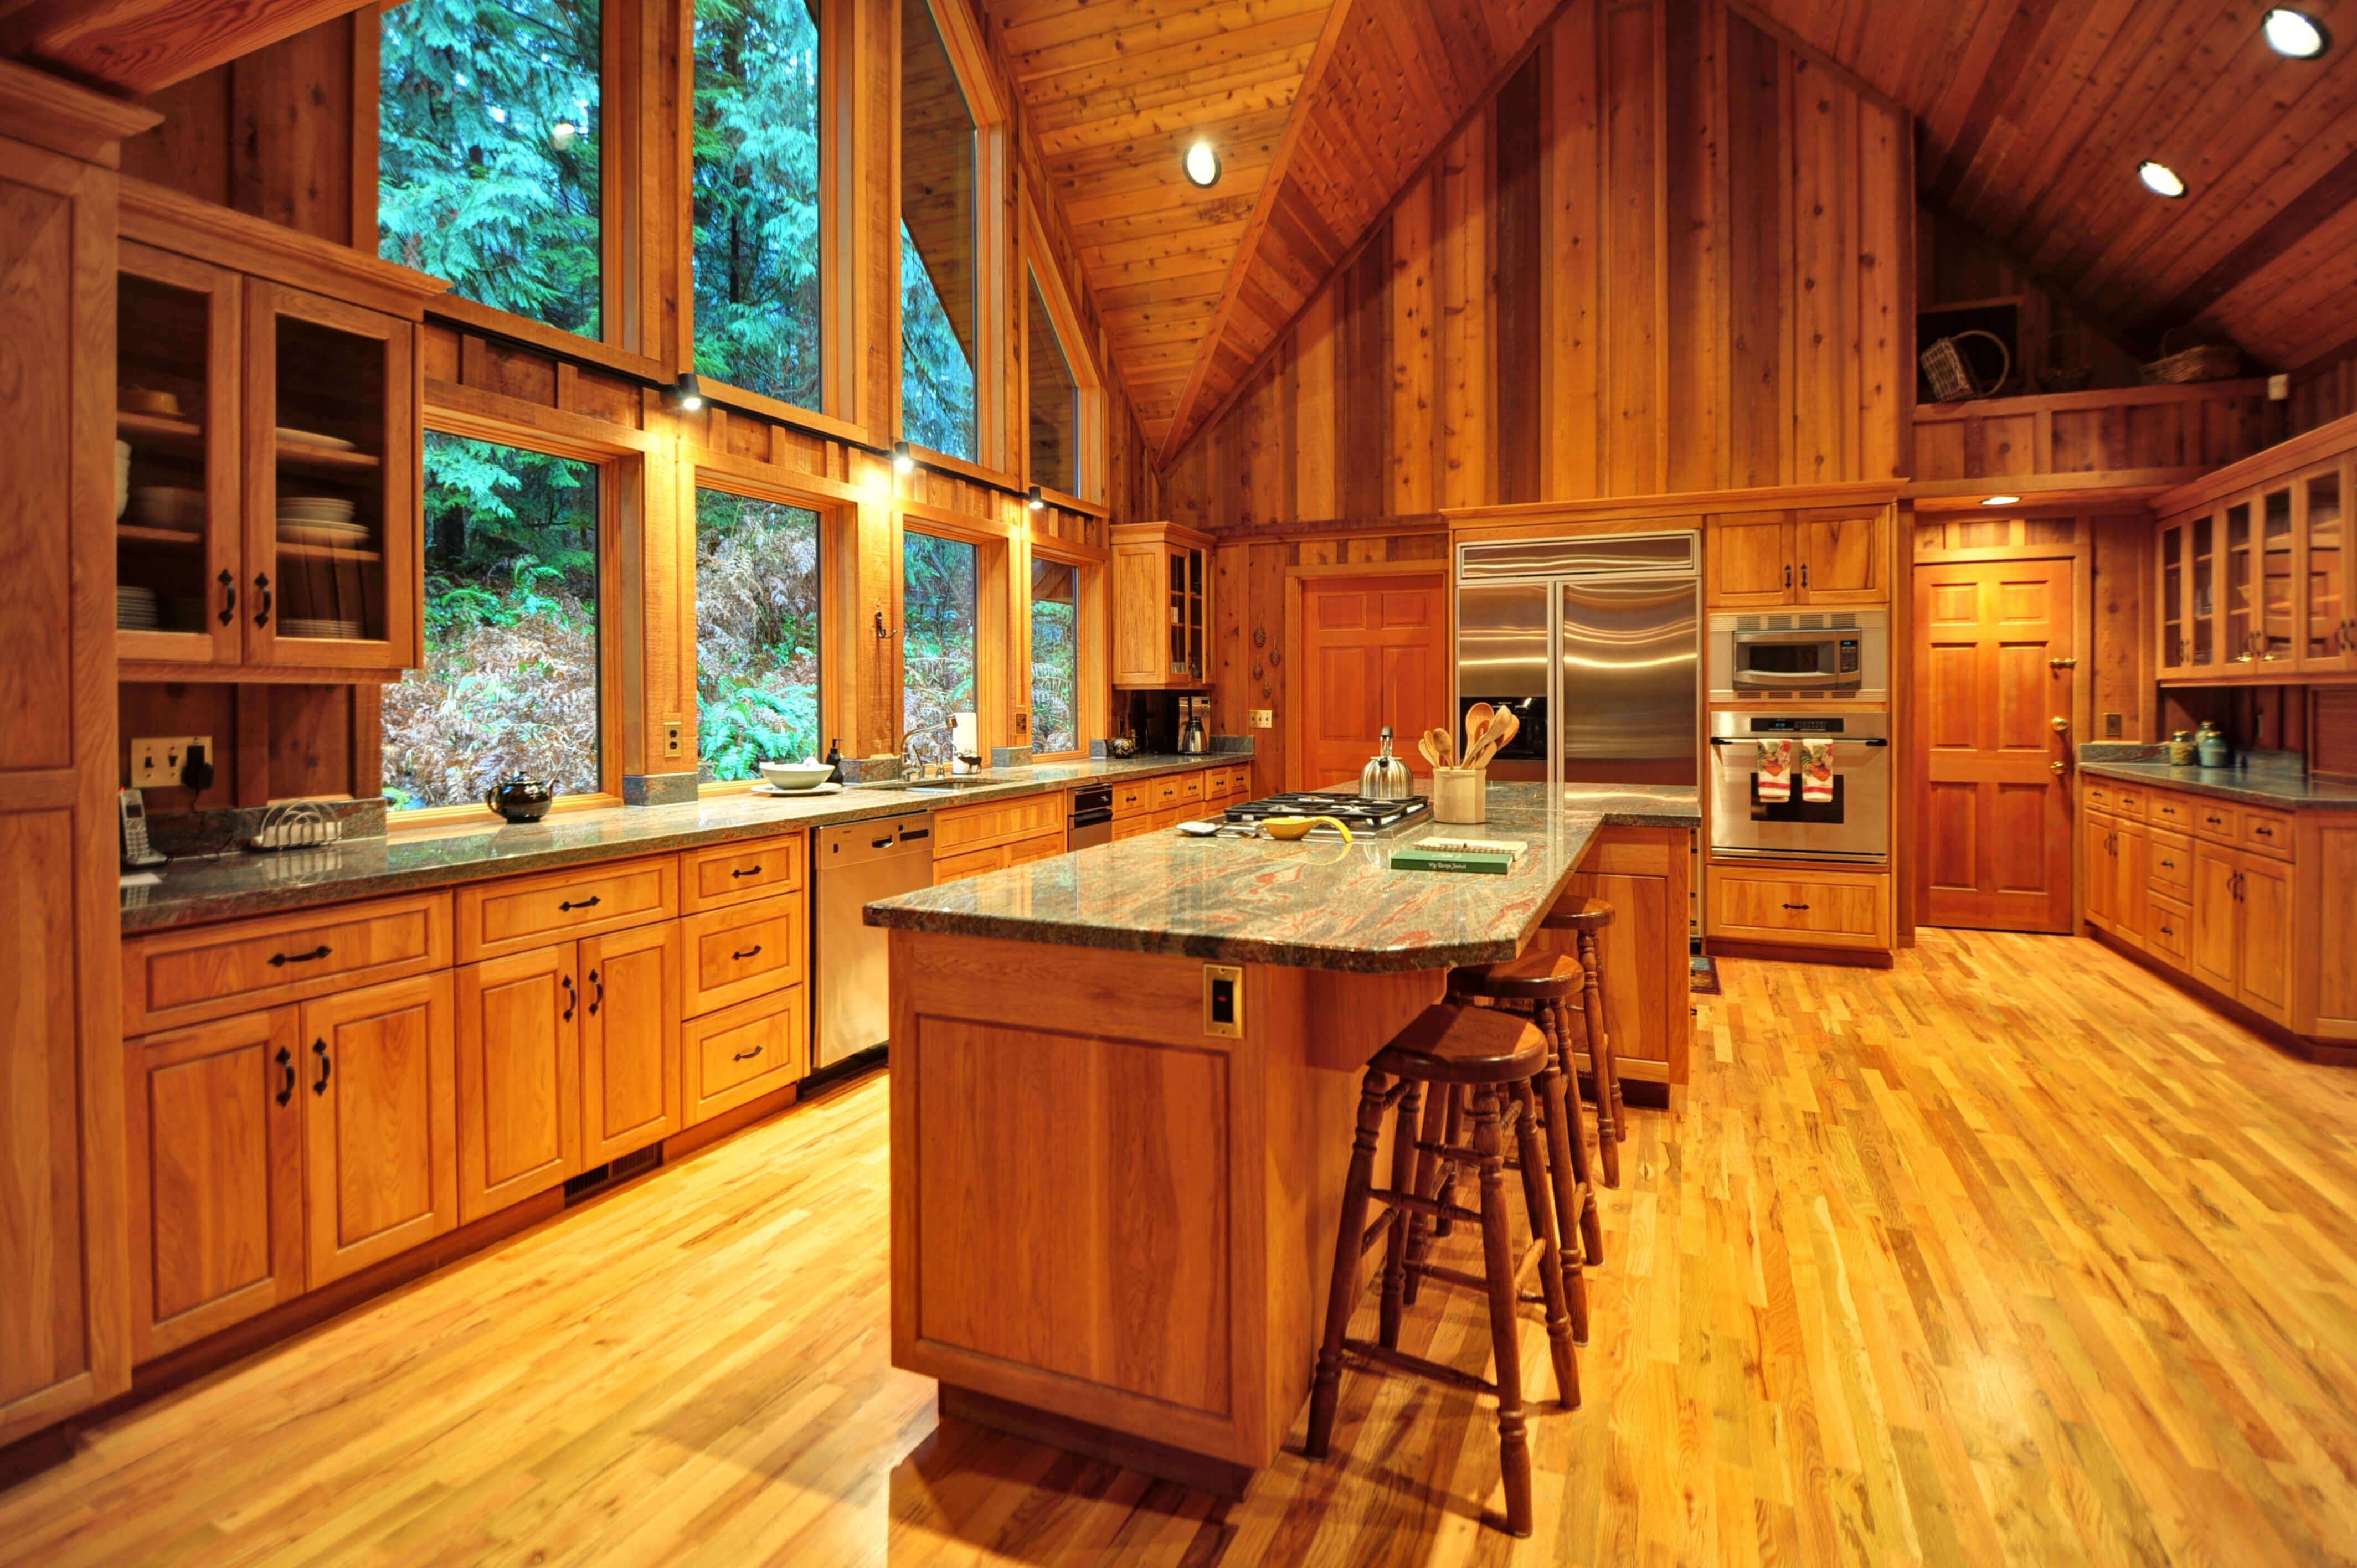 68+deluxe custom kitchen island ideas (jaw dropping designs) | rustic kitchen island, kitchen